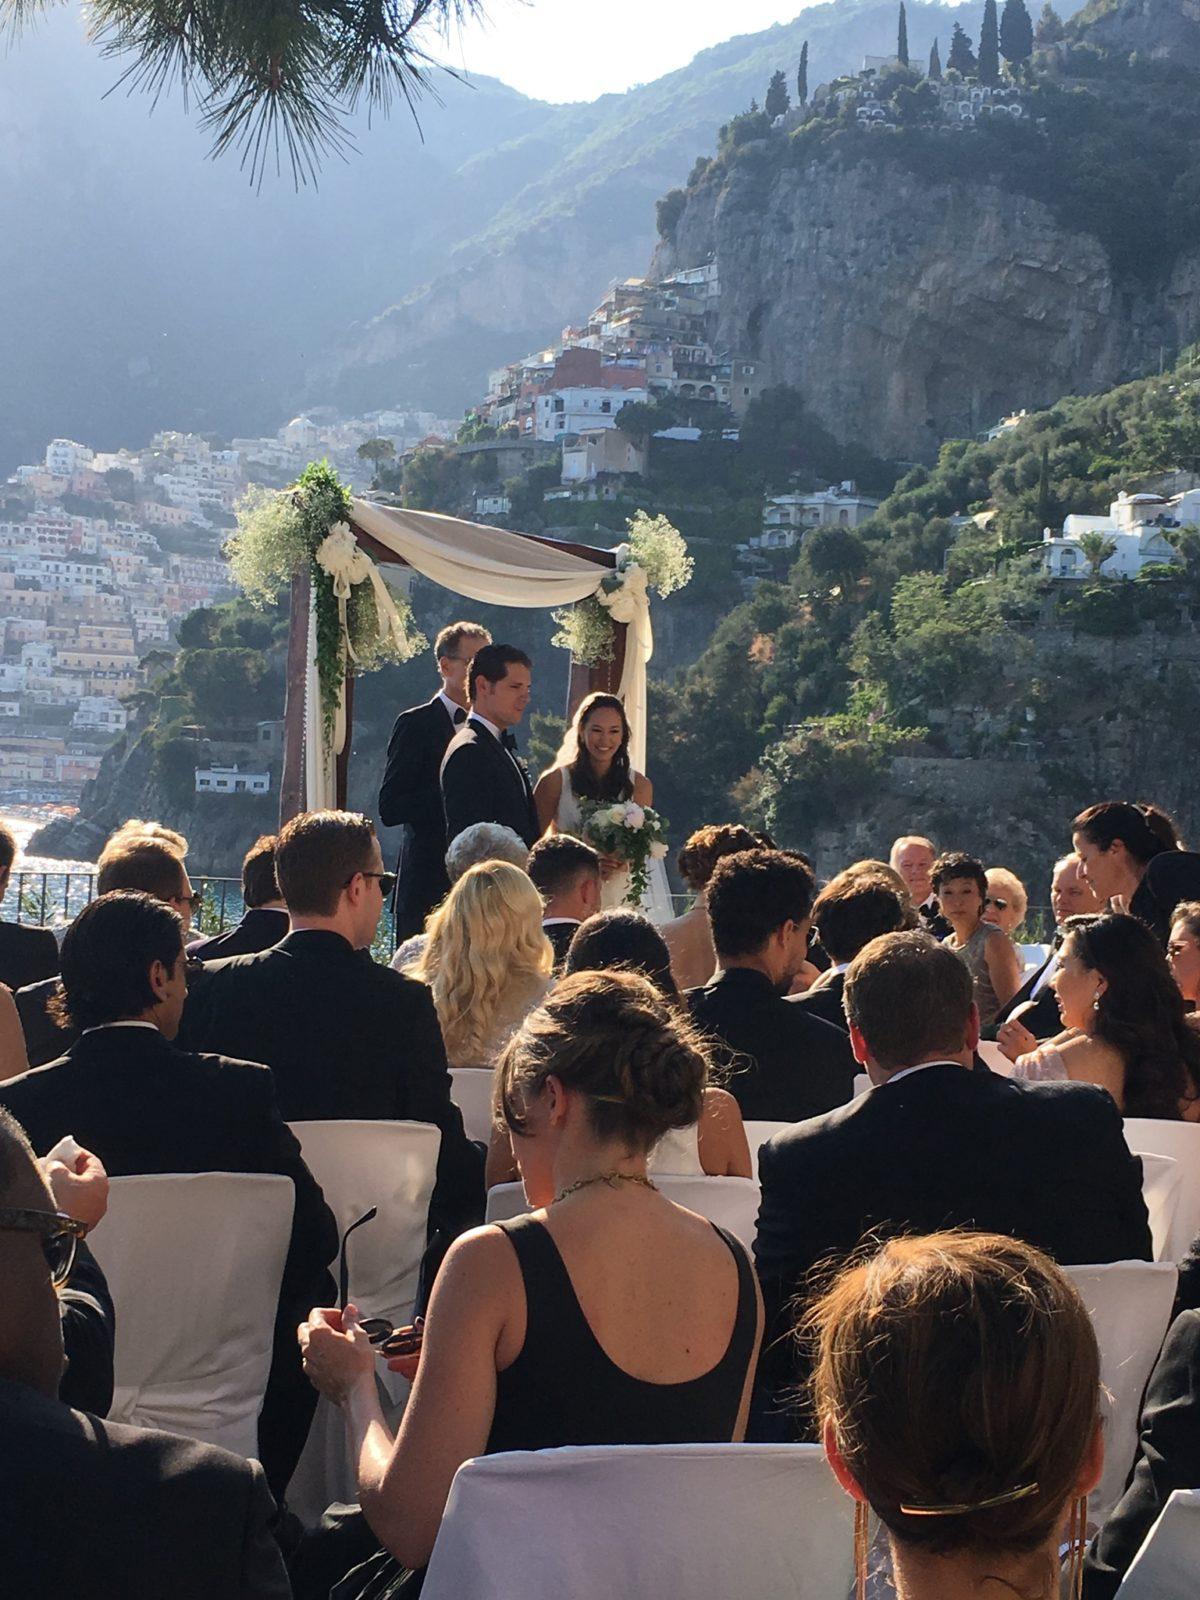 Nathalie and Benjamin Wedding in Positano Italy (4)